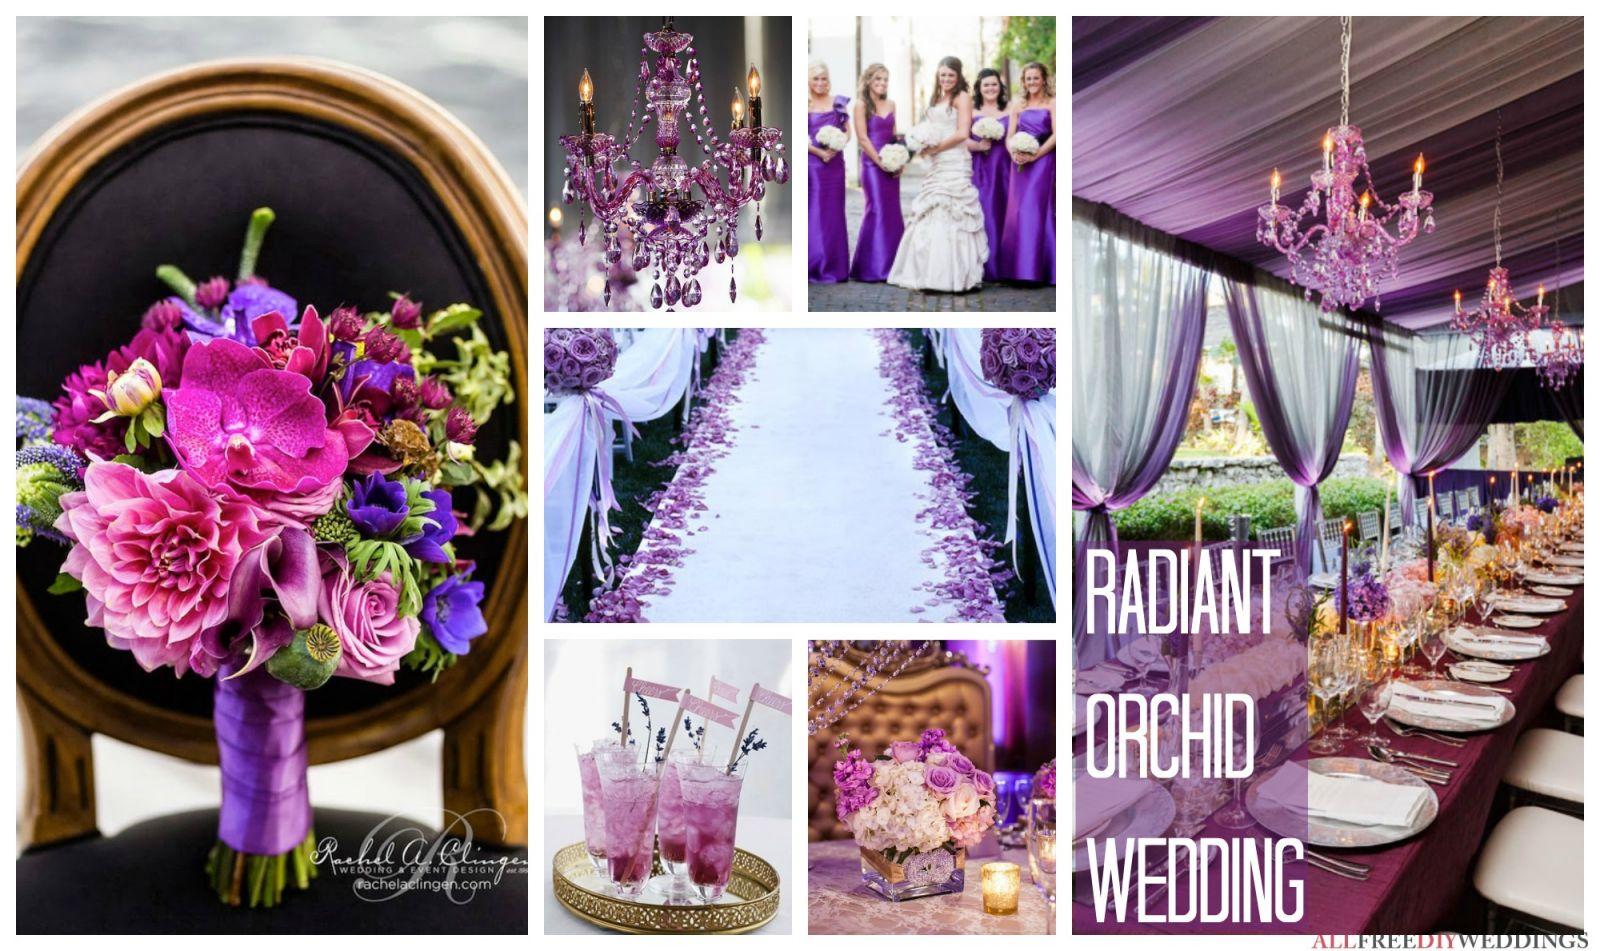 Wedding Color Schemes: 35+ Wedding Color Combinations And